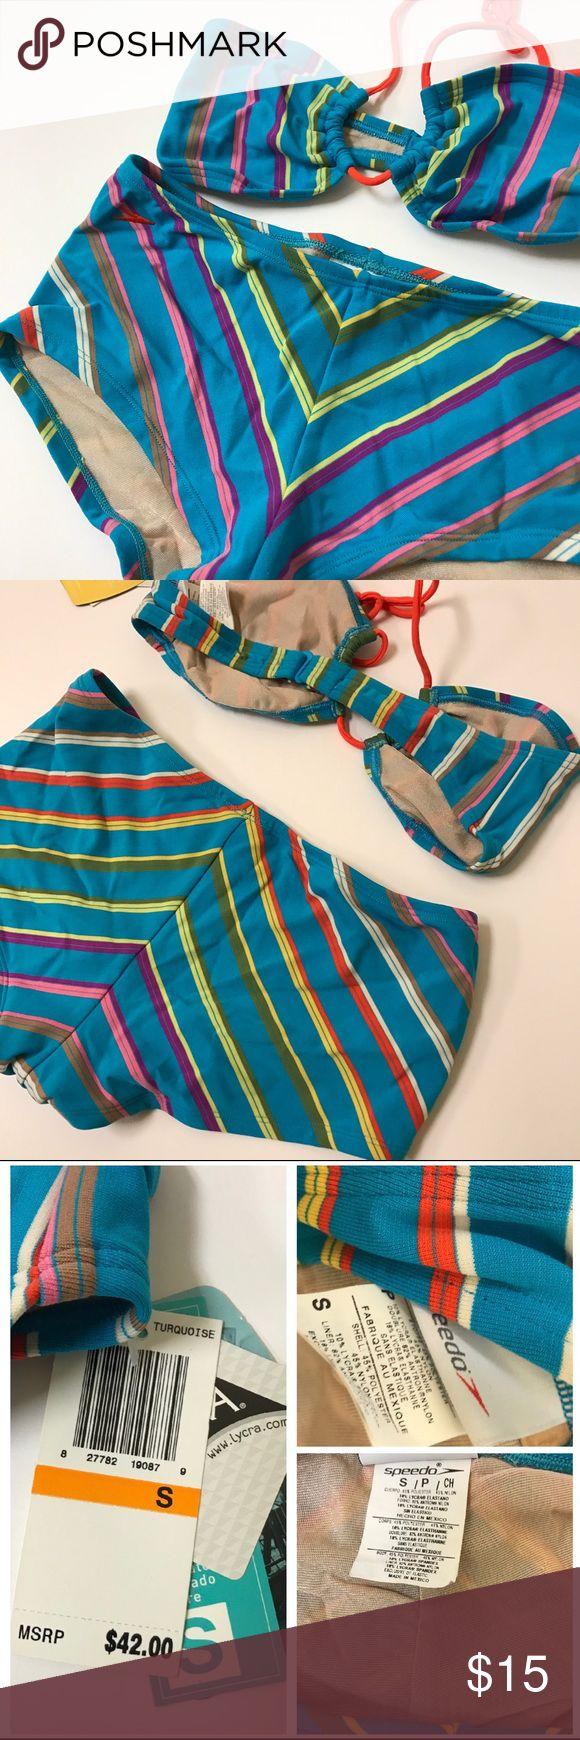 Sexy n' Sporty Striped Speedo Bikini Be bold. Be sexy. Be whatever you please in this striped bikini! TOP // fluorescent orange string top with peek-a-boo opening in the center. BOTTOM // wide waist band, cheeky cut. Speedo Swim Bikinis